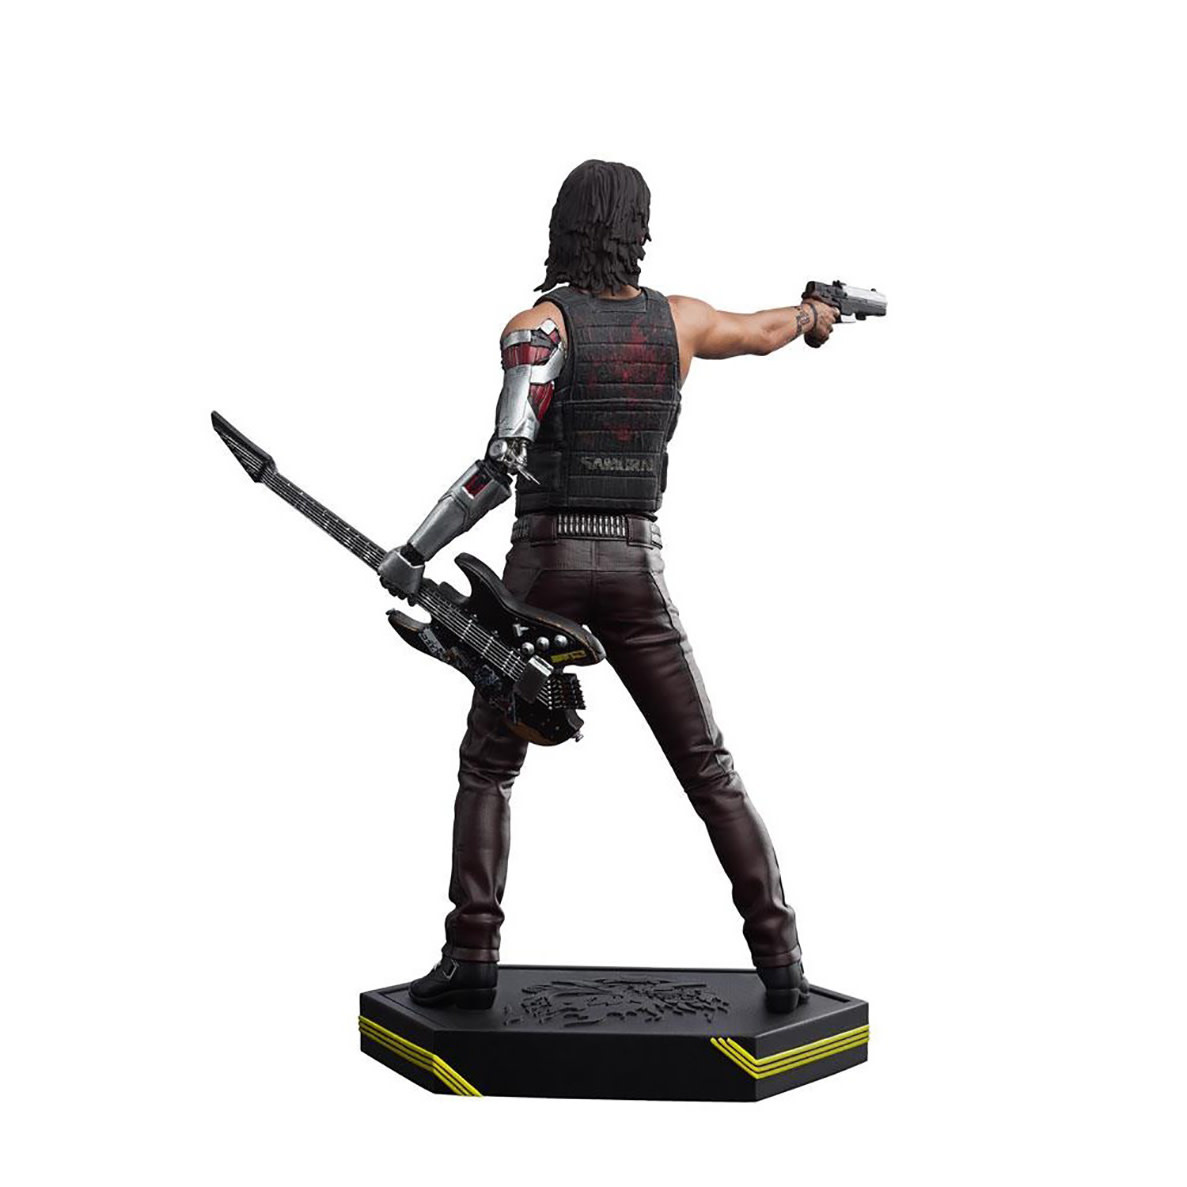 Dark Horse Cyberpunk 2077: Johnny Silverhand 9.5 inch PVC Statue